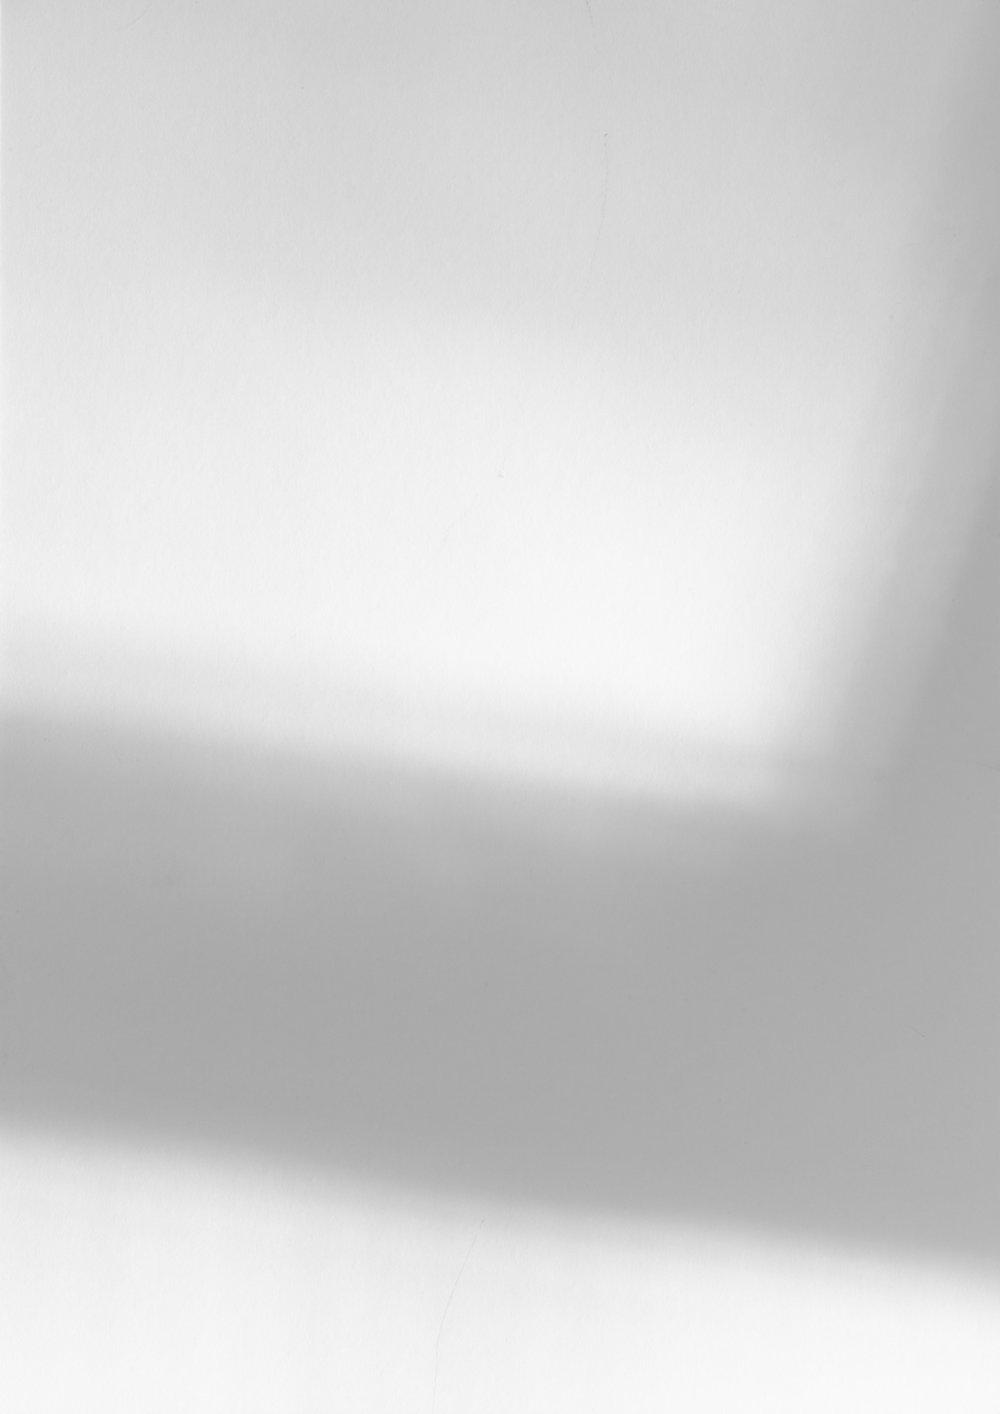 L1010139.jpg